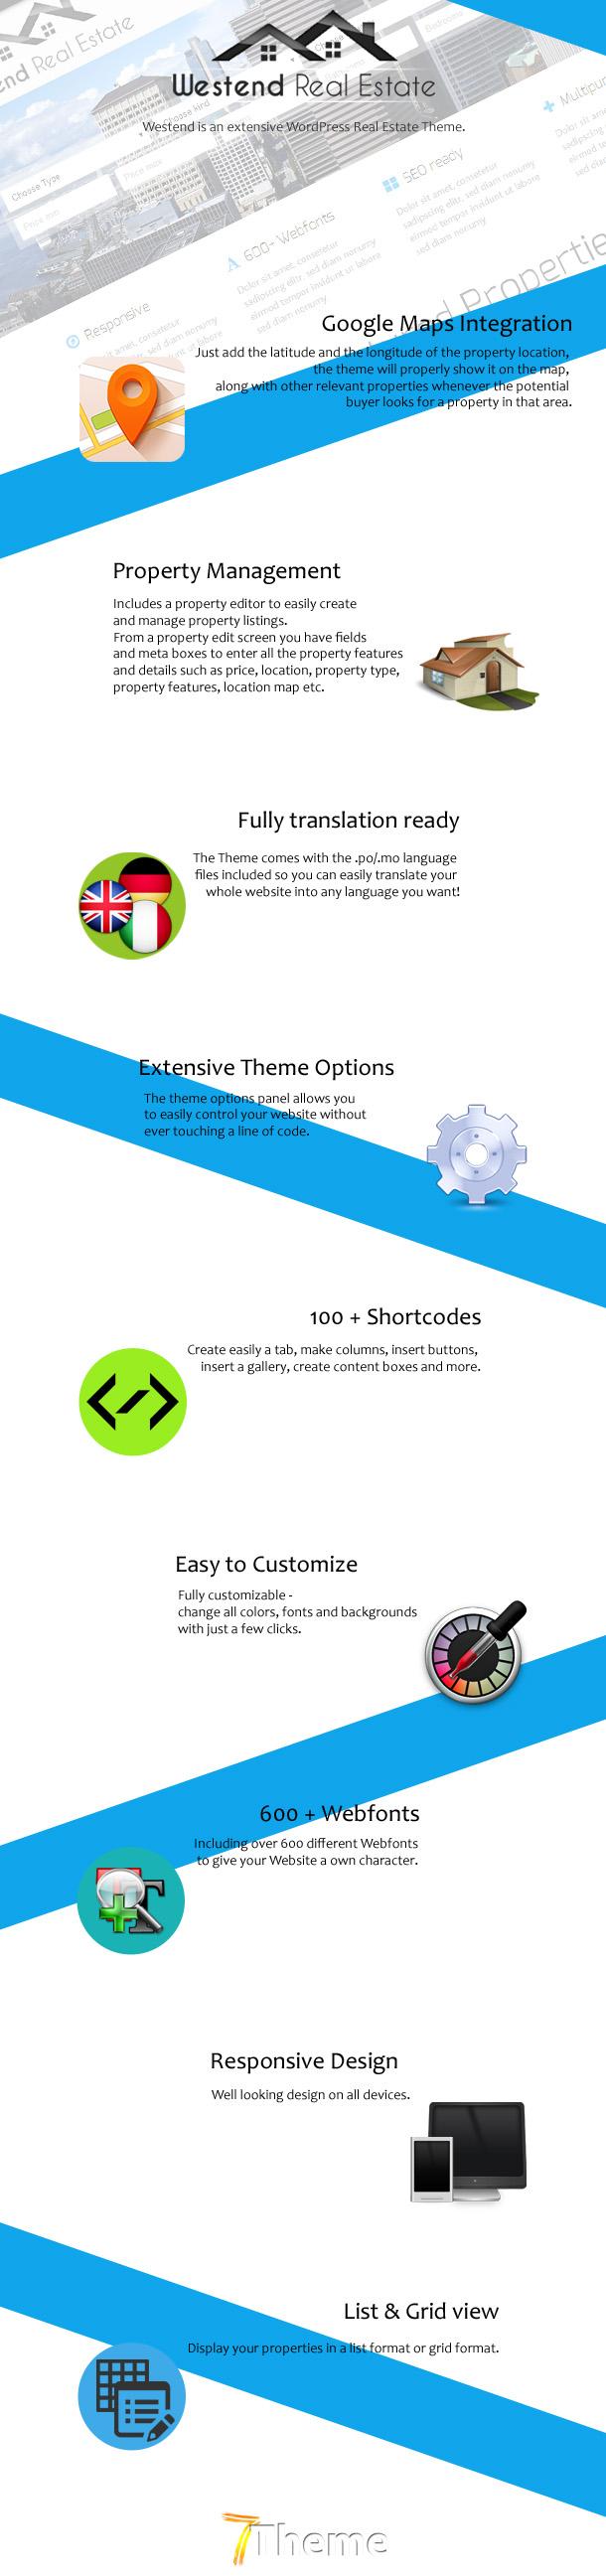 Westend Real Estate WordPress Theme